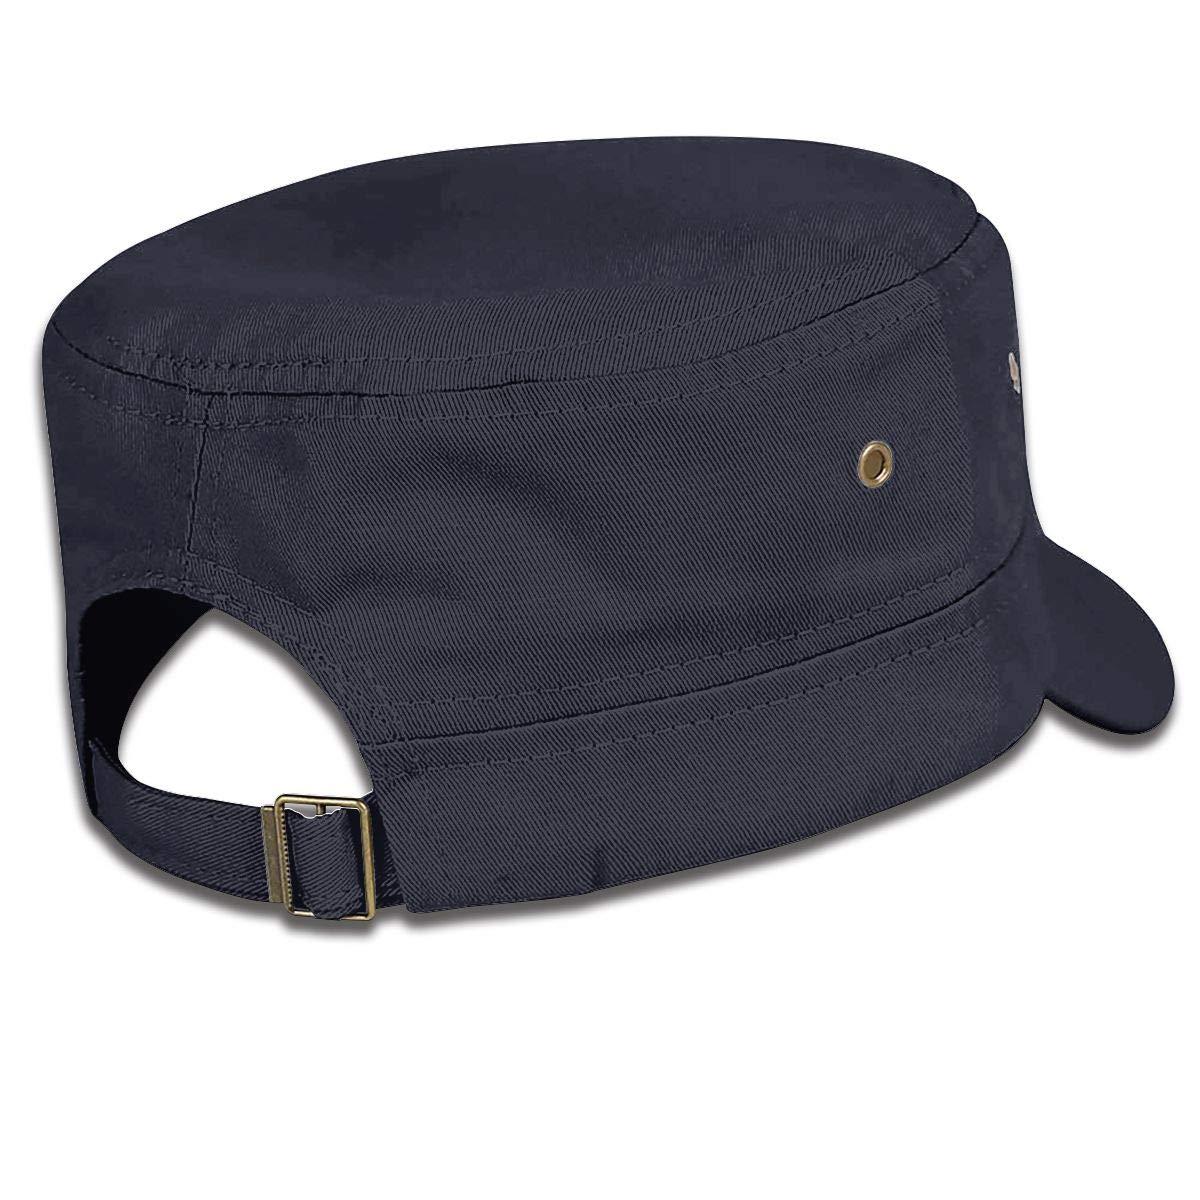 Mermaids Unisex Adult Cotton Military Army Cap Flat Top Hat